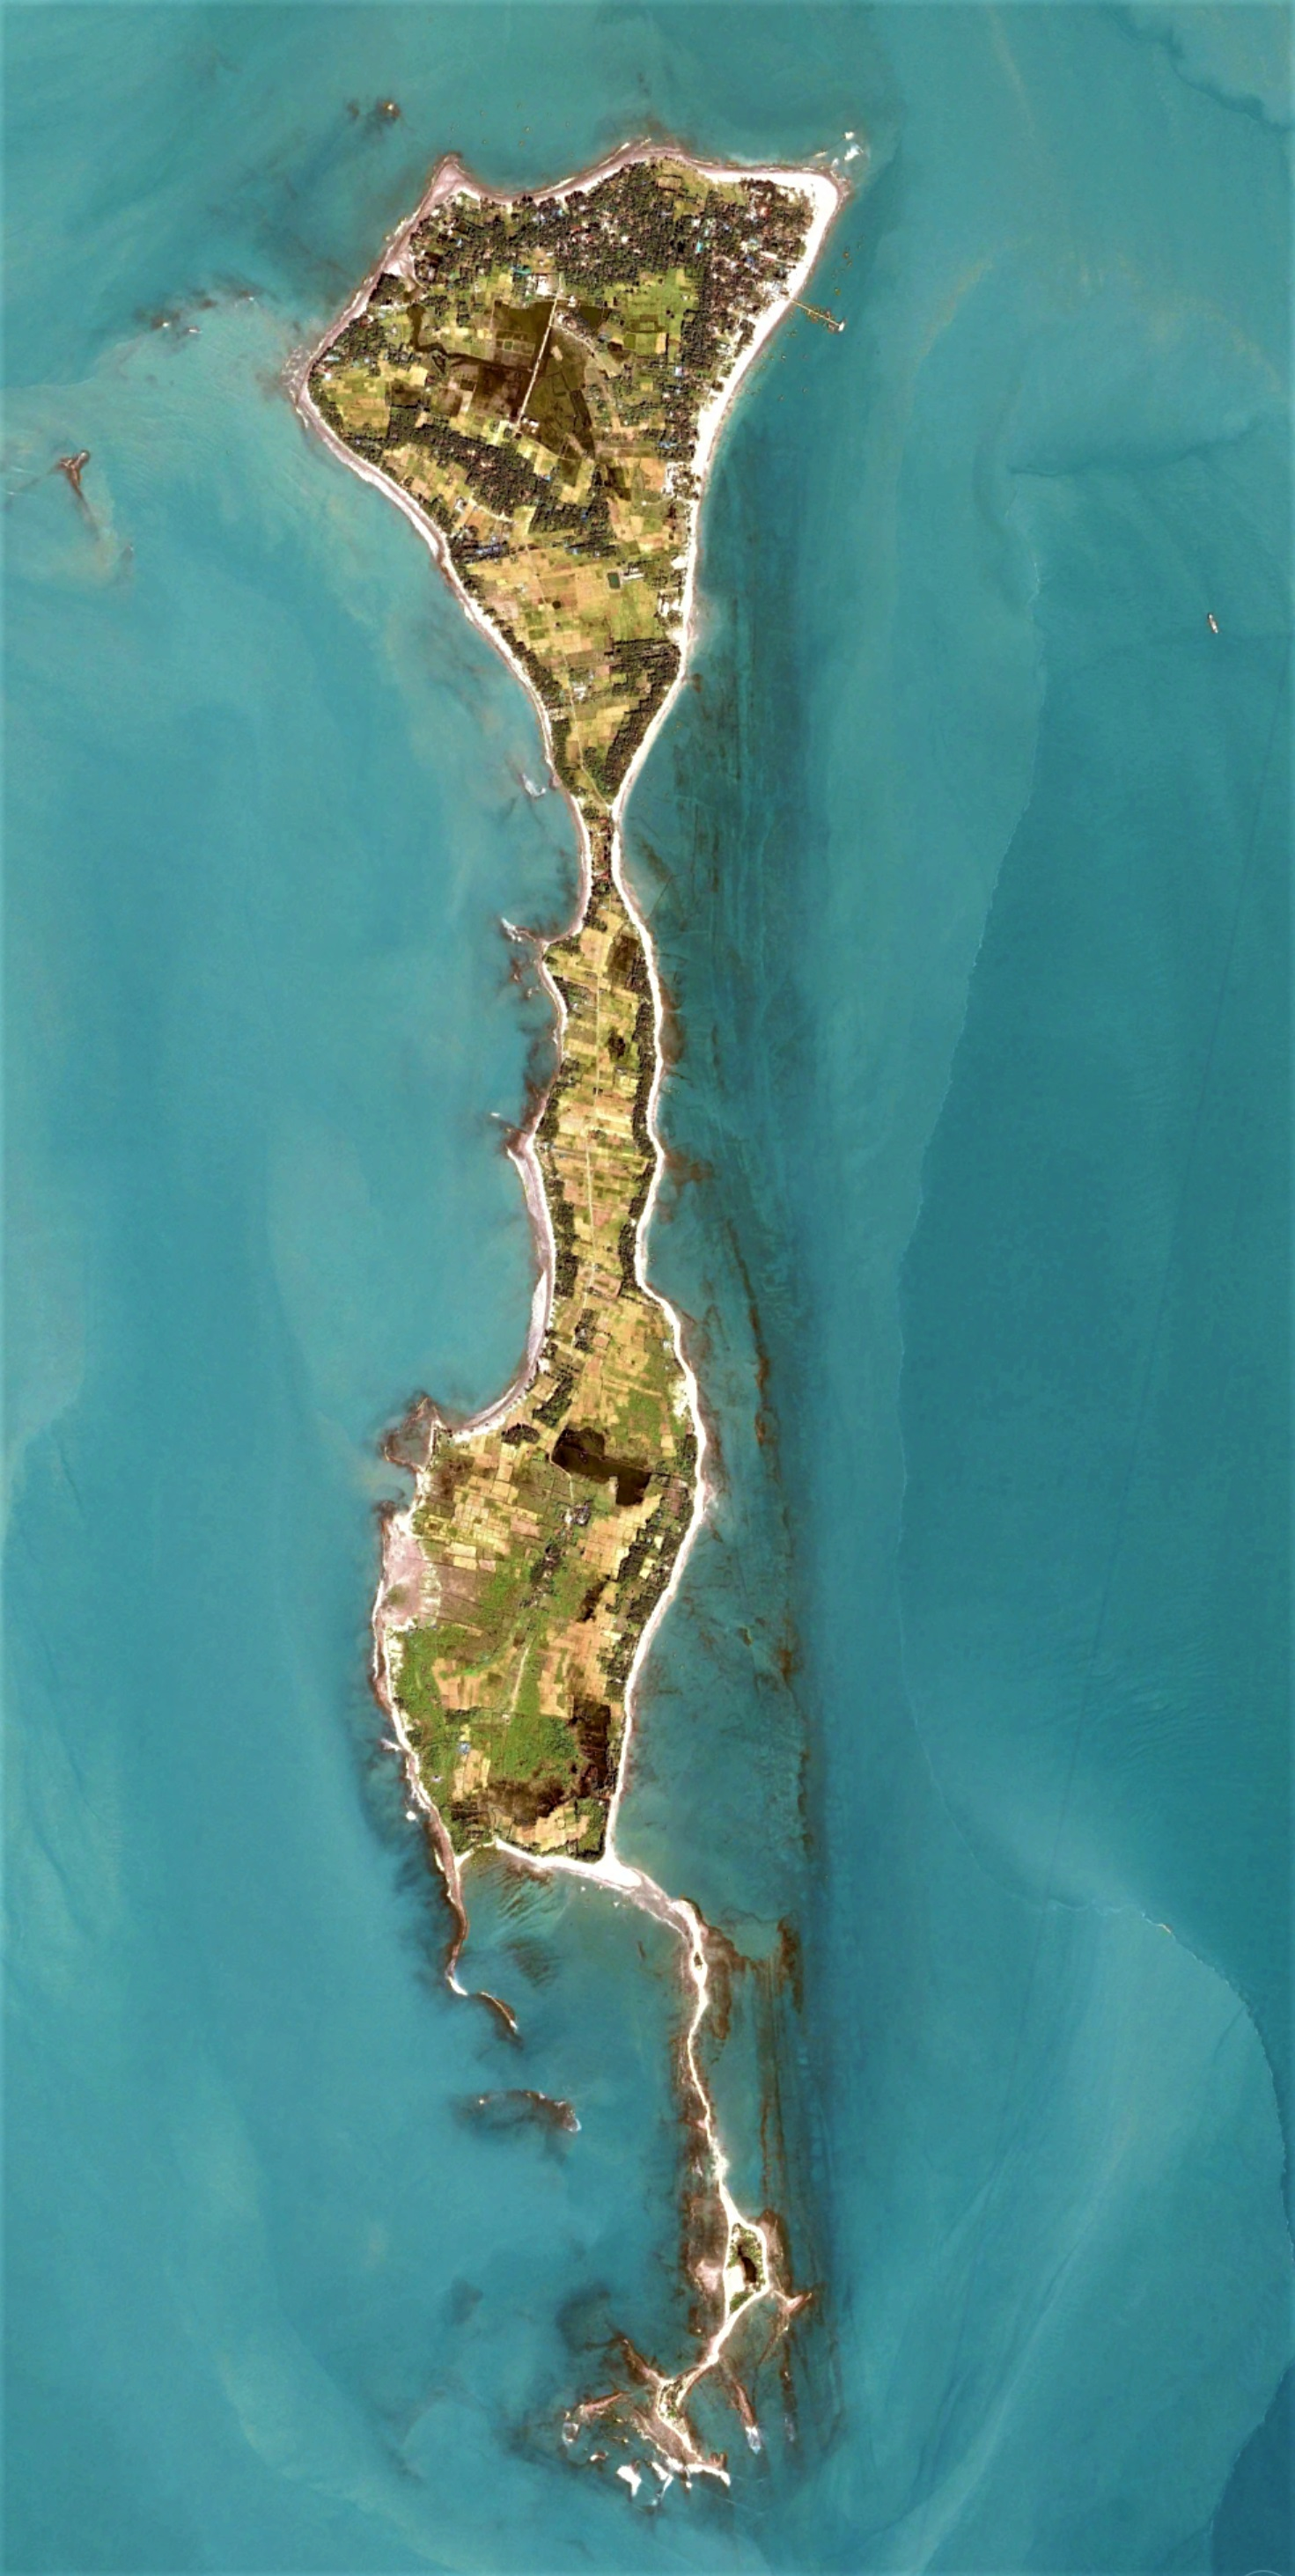 Saint Martin island. Image width: 3.5 kilometers